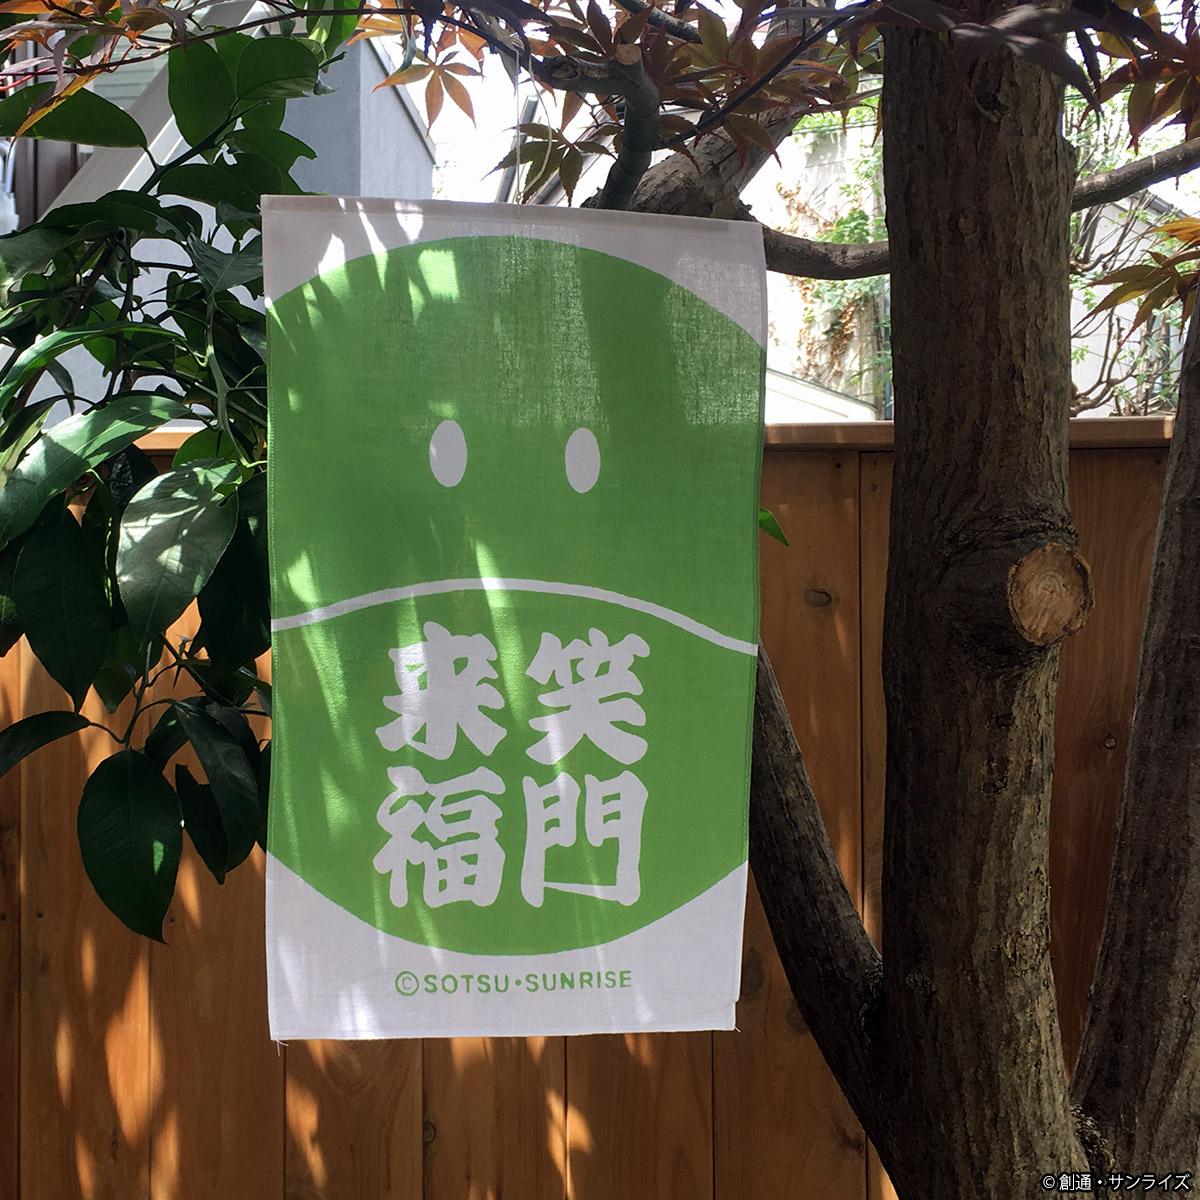 STRICT-G × かまわぬ『機動戦士ガンダム』招布 ハロ 笑門来福